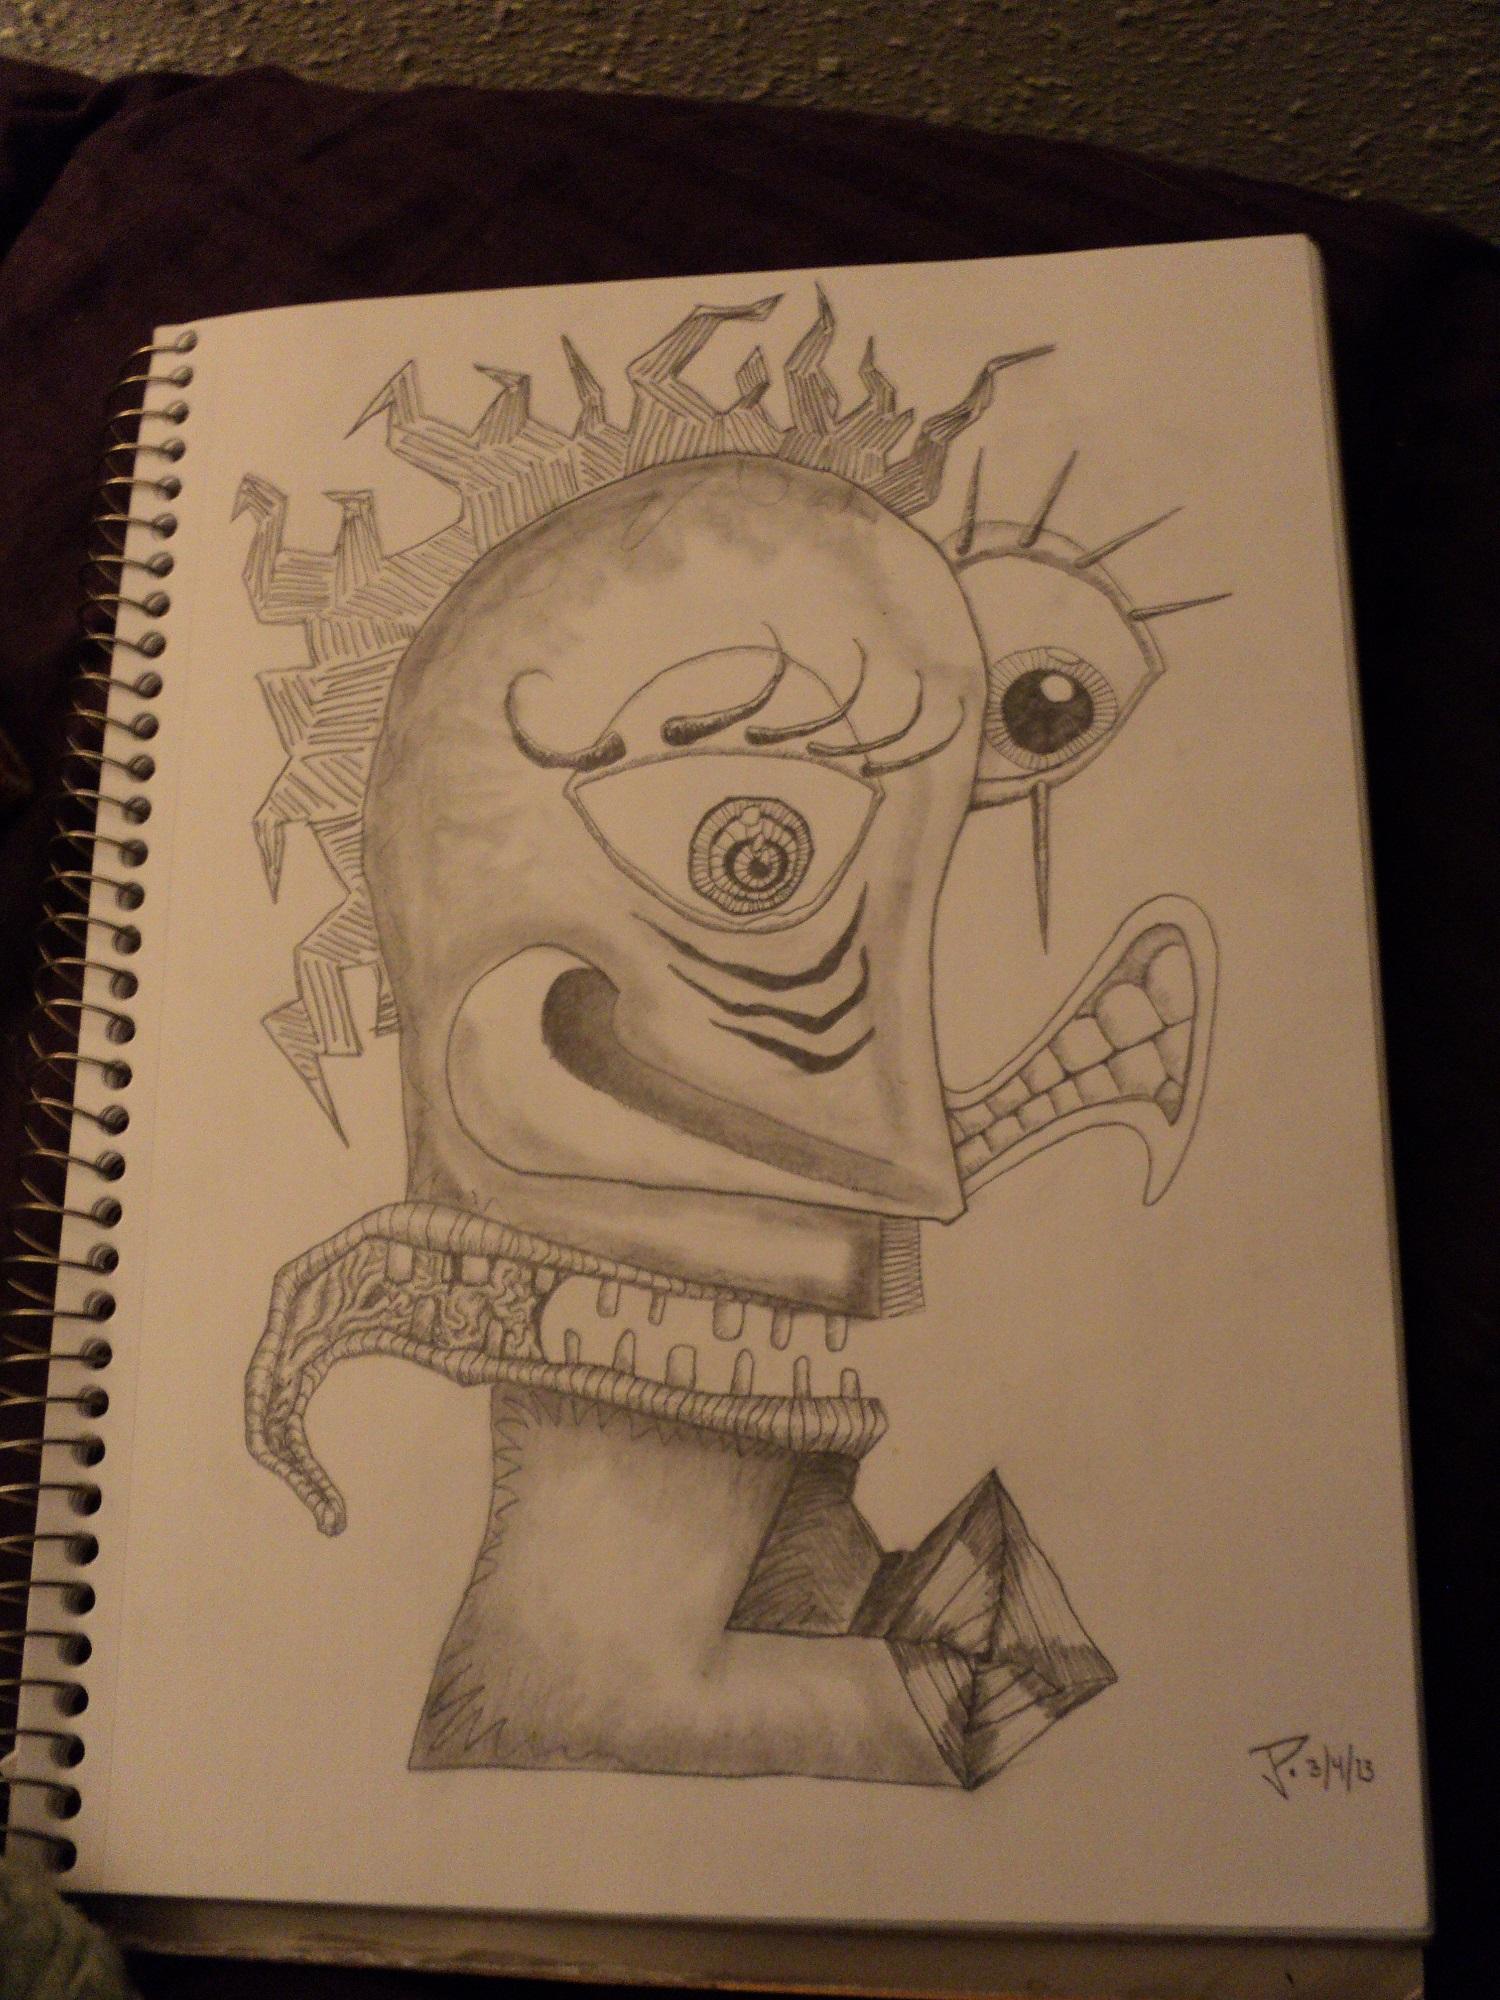 Drawn feelings notebook #4